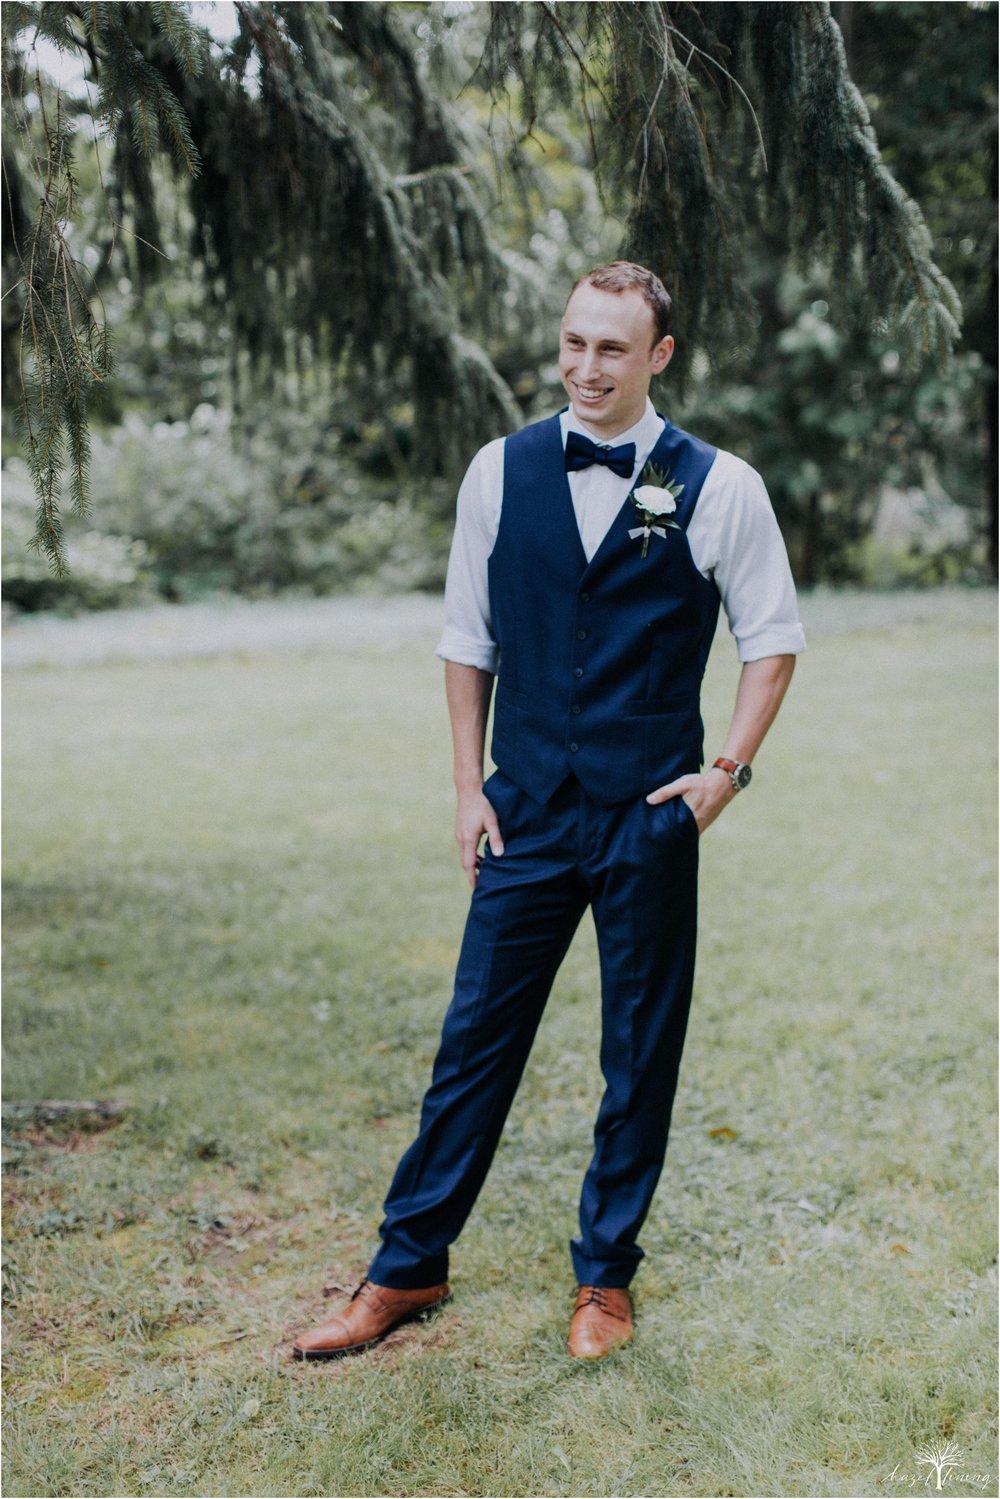 mariah-kreyling-samuel-sherratt-sherrattwiththeworld-peirce-farm-at-witch-hill-boston-massachusetts-wedding-photography-hazel-lining-travel-wedding-elopement-photography_0047.jpg